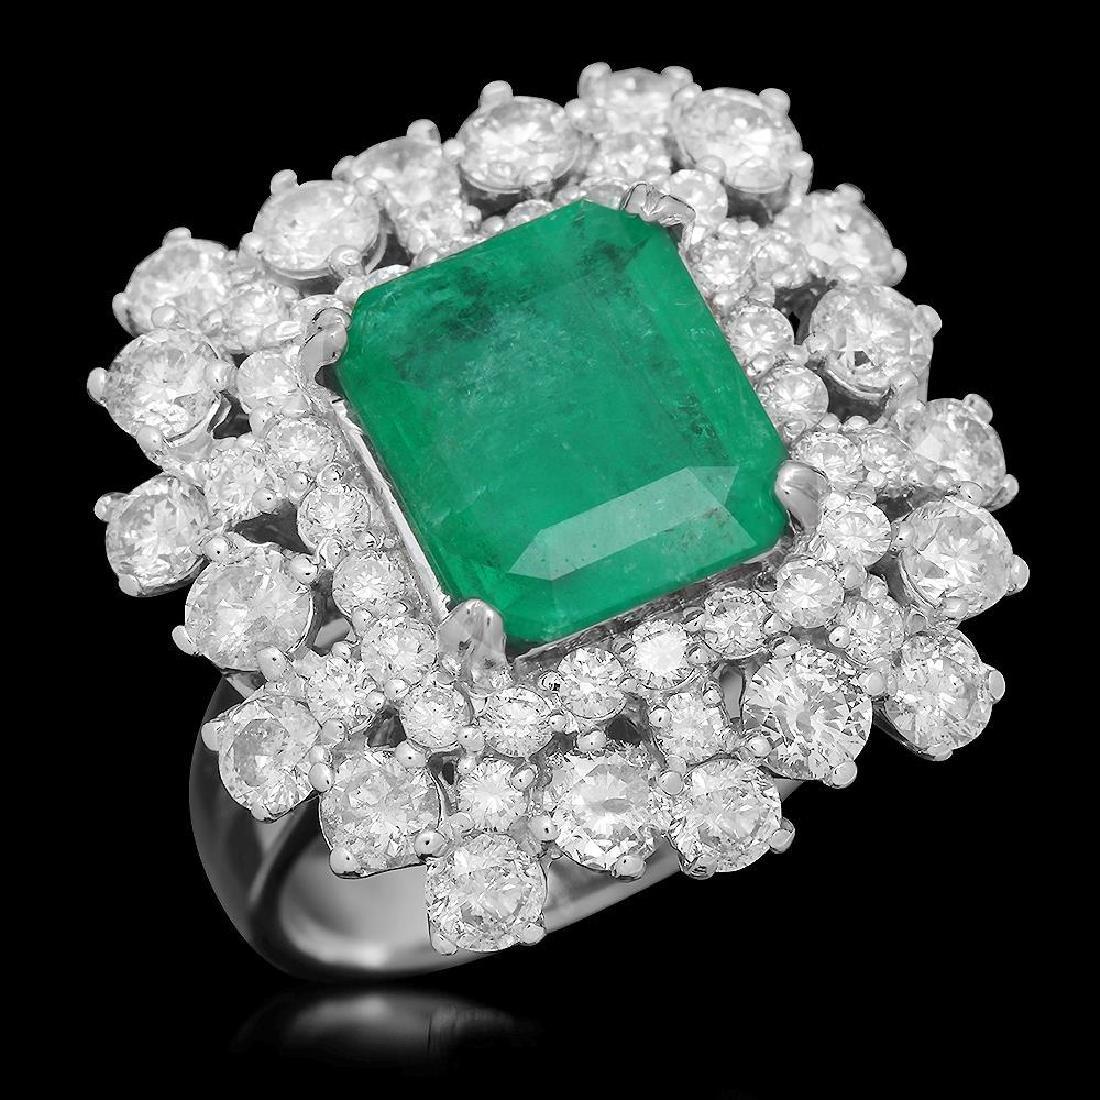 14K Gold 2.96 Emerald 2.81 Diamond Ring